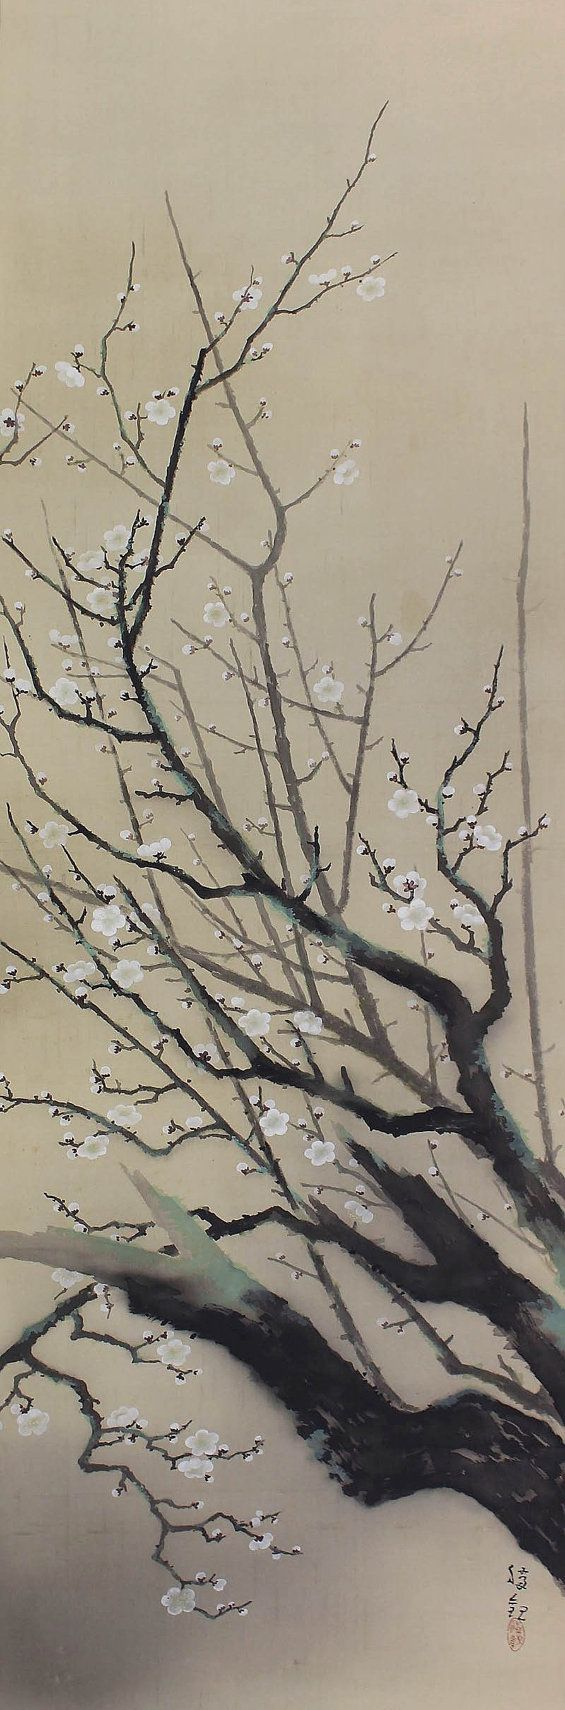 White Plum Blossoms by Ochi Shokan. Japanese Art hanging scroll painting.